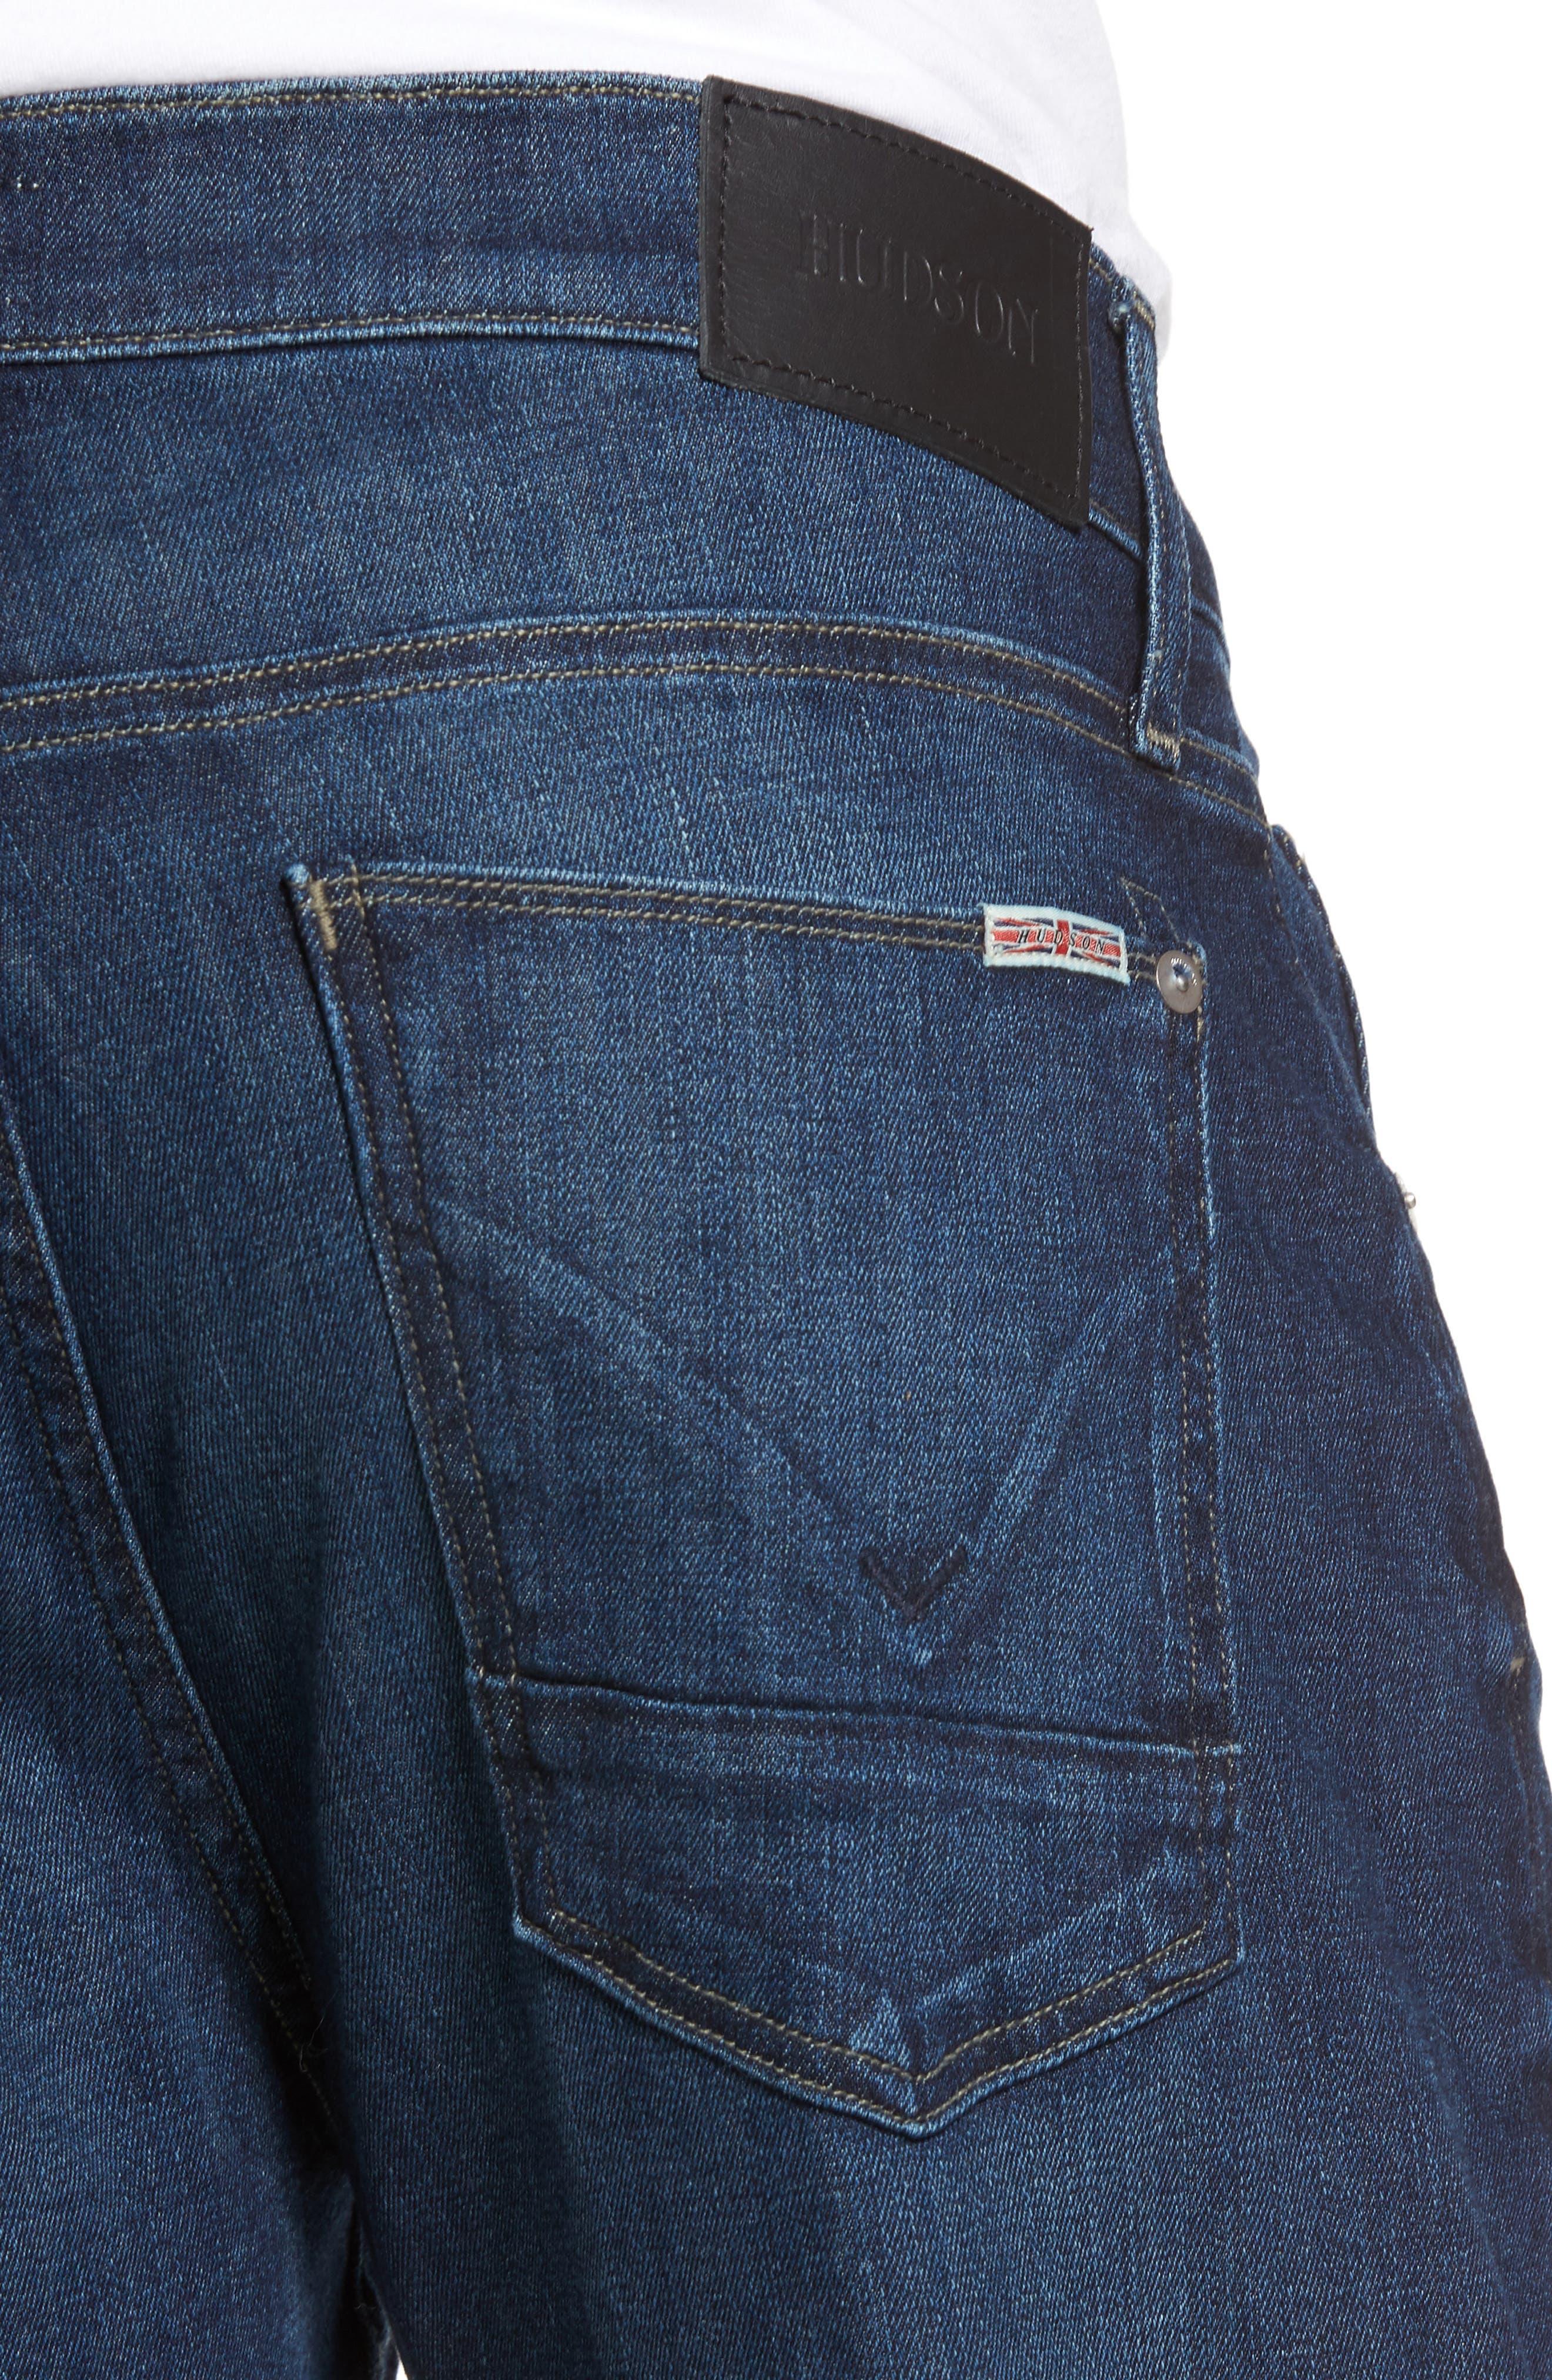 Byron Slim Straight Fit Jeans,                             Alternate thumbnail 4, color,                             Draper